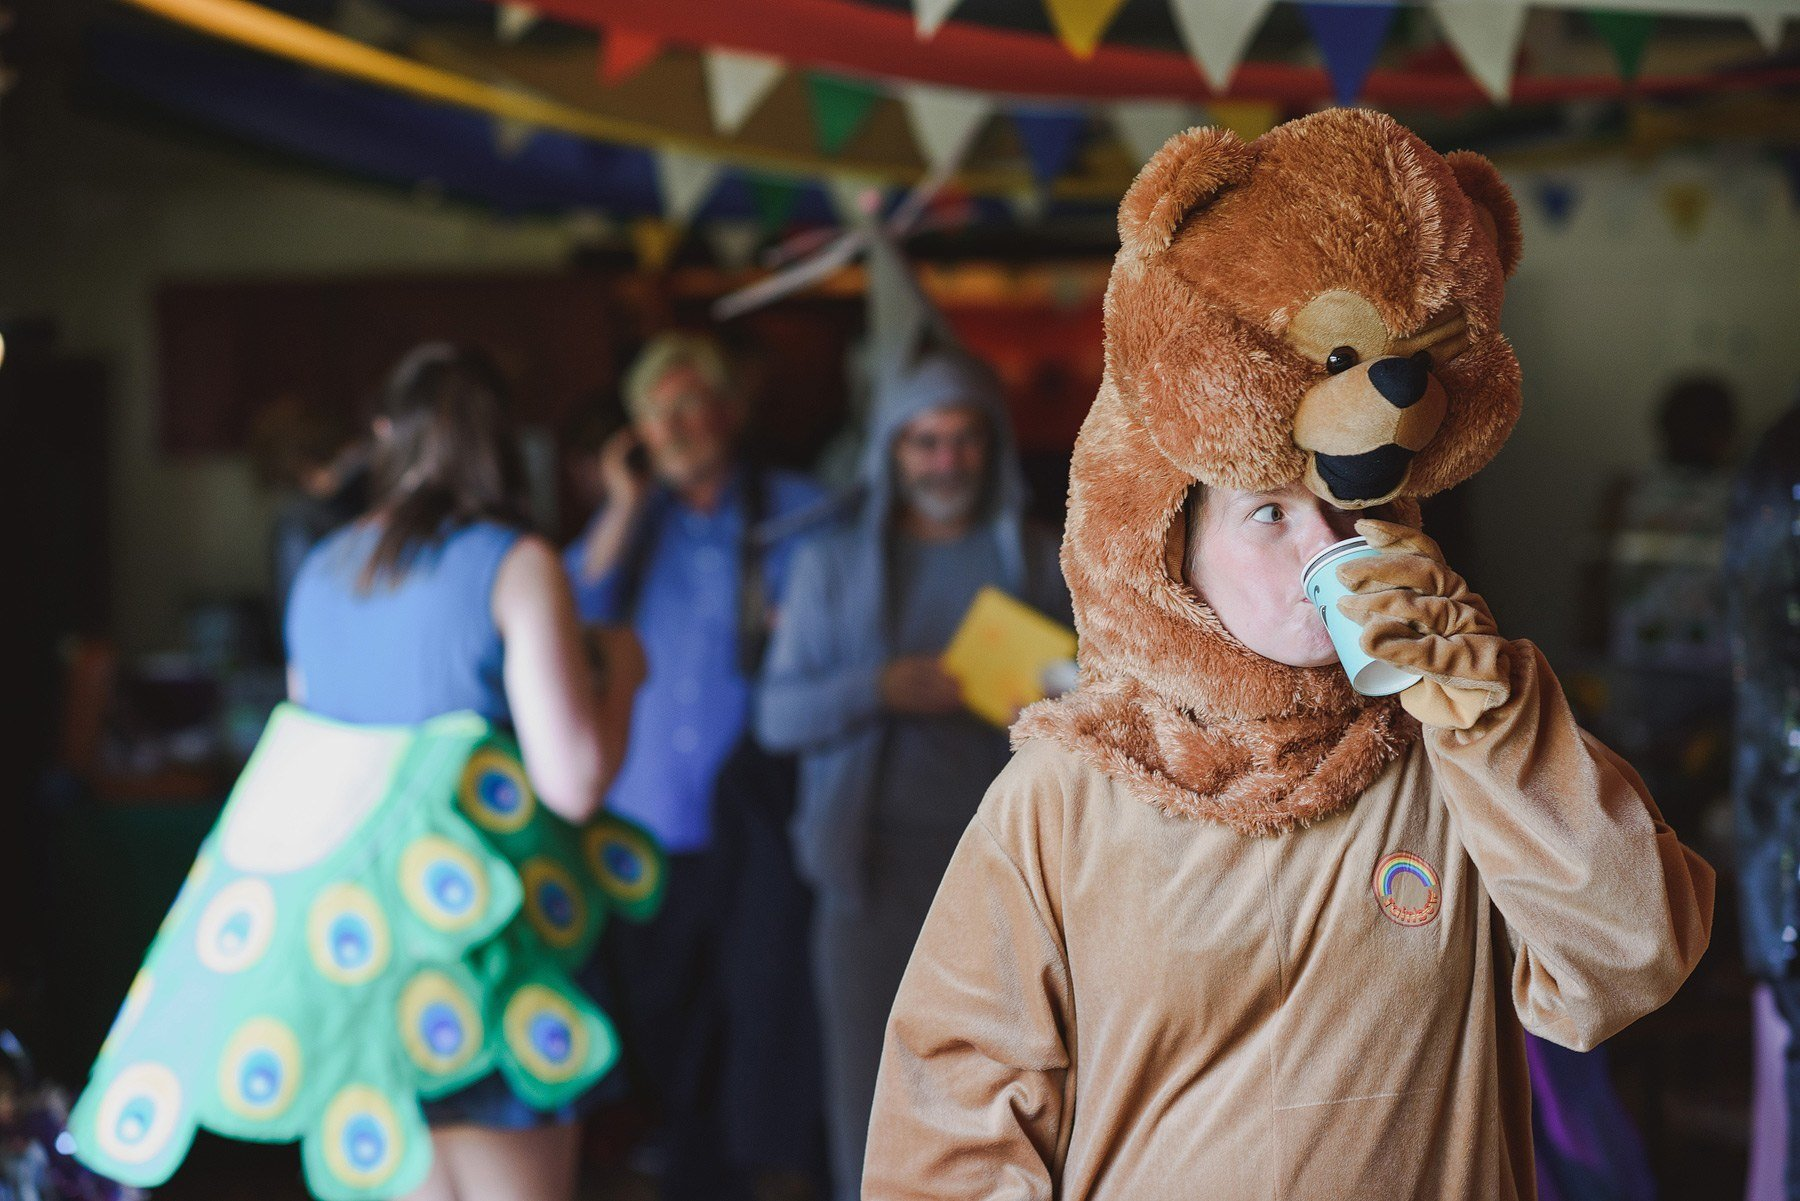 wedding guest dressed as a bear